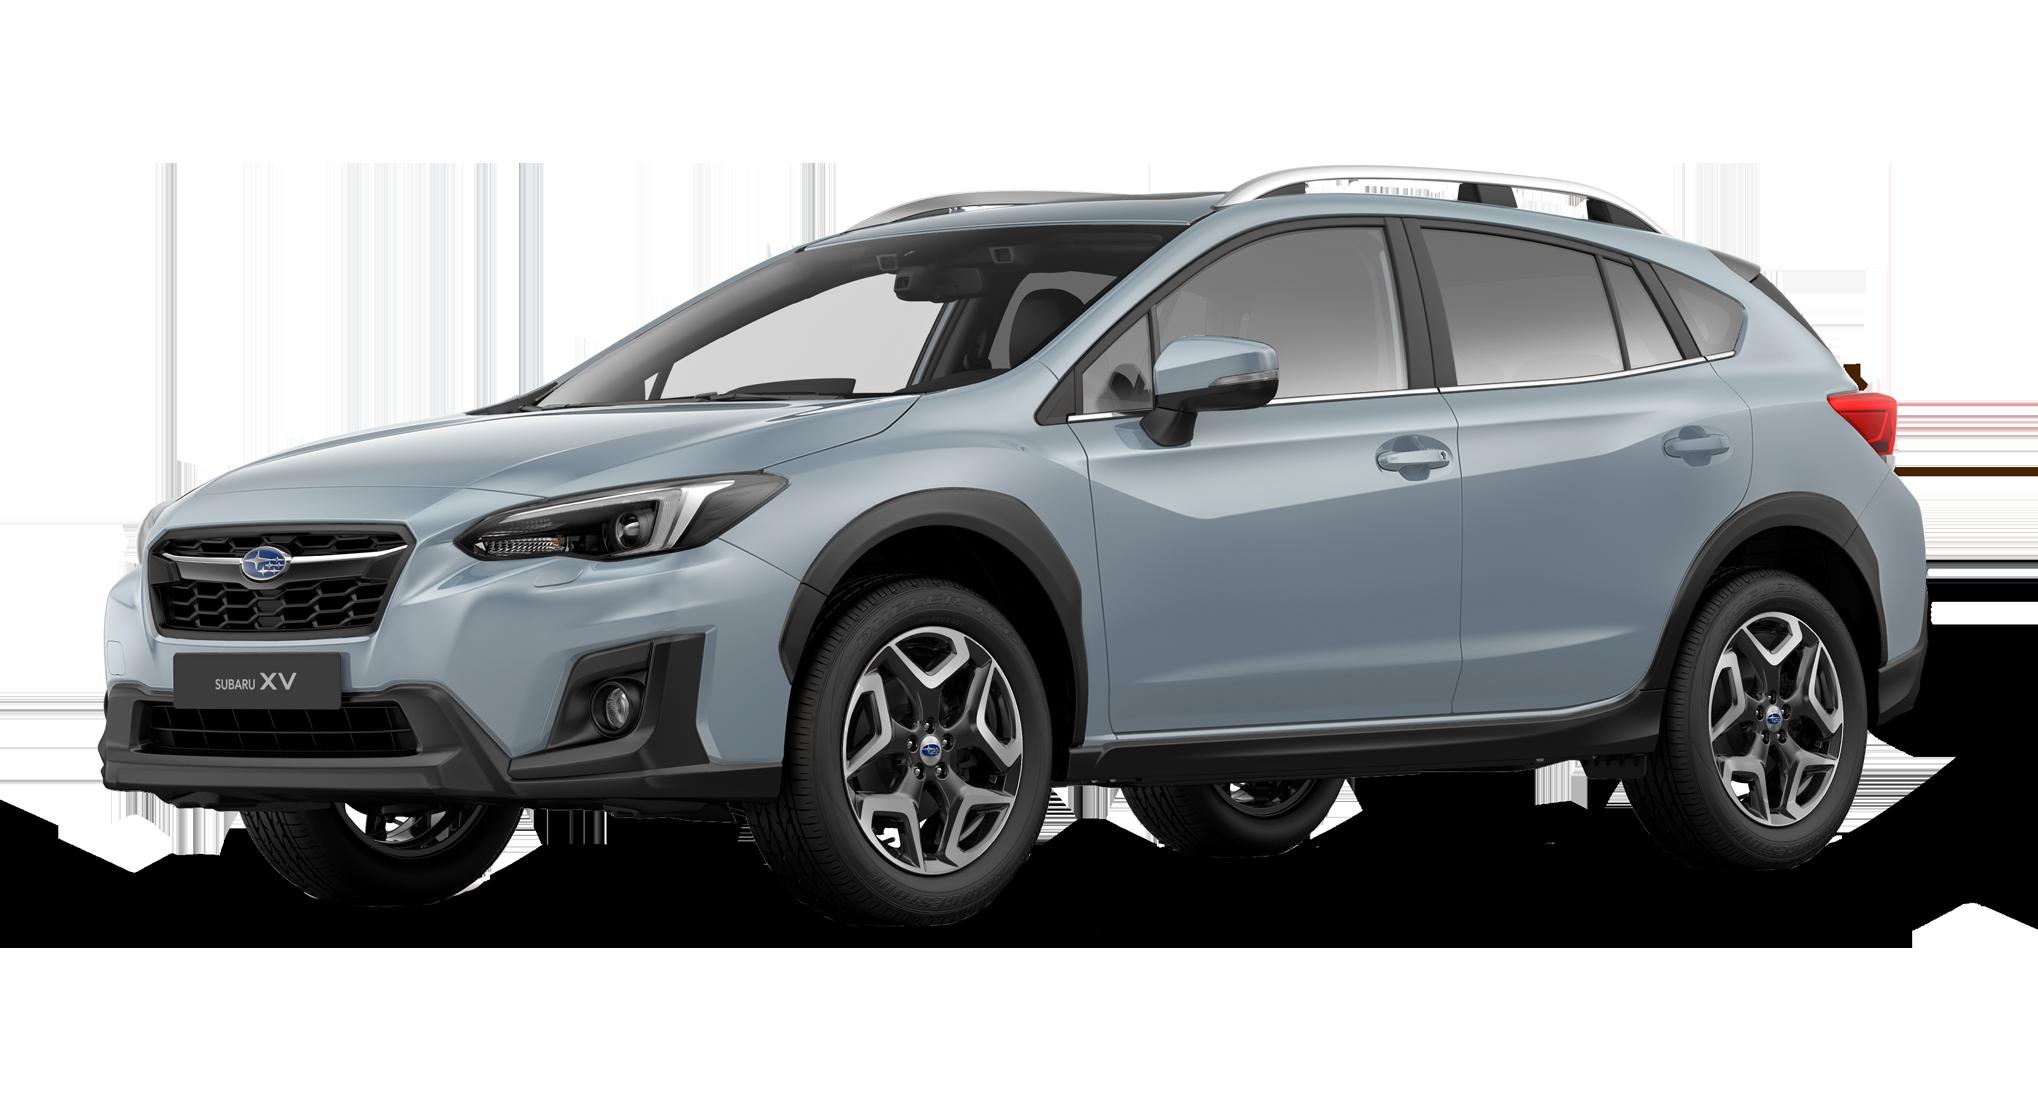 Subaru XV neues Modell